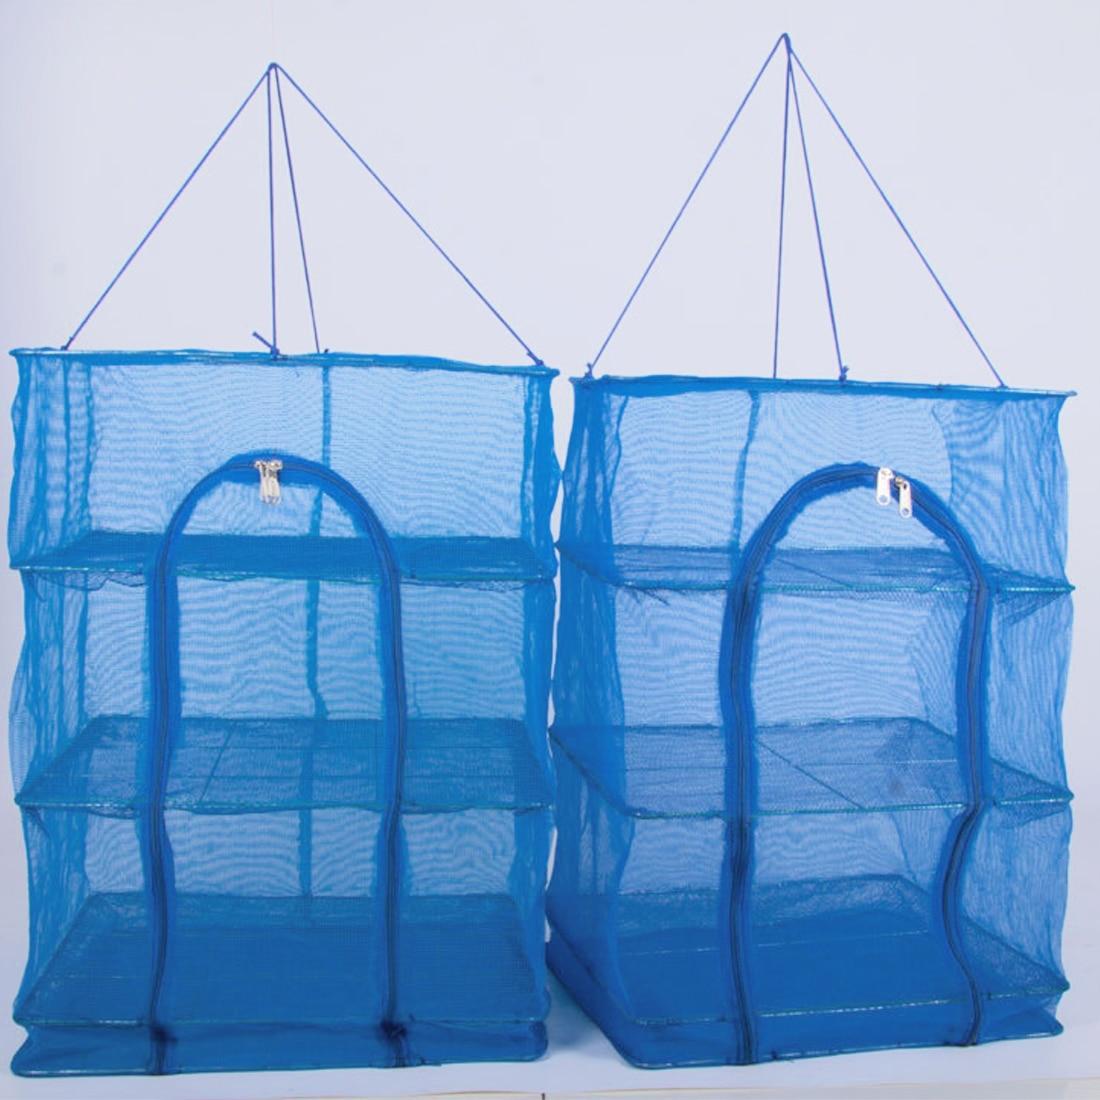 New Foldable 3 Layers Drying Net Fish Net Drying Rack Hanging Vegetable Fish Dishes Dryer Net 40 x 40 x 68cm PE Hanger Fish Net